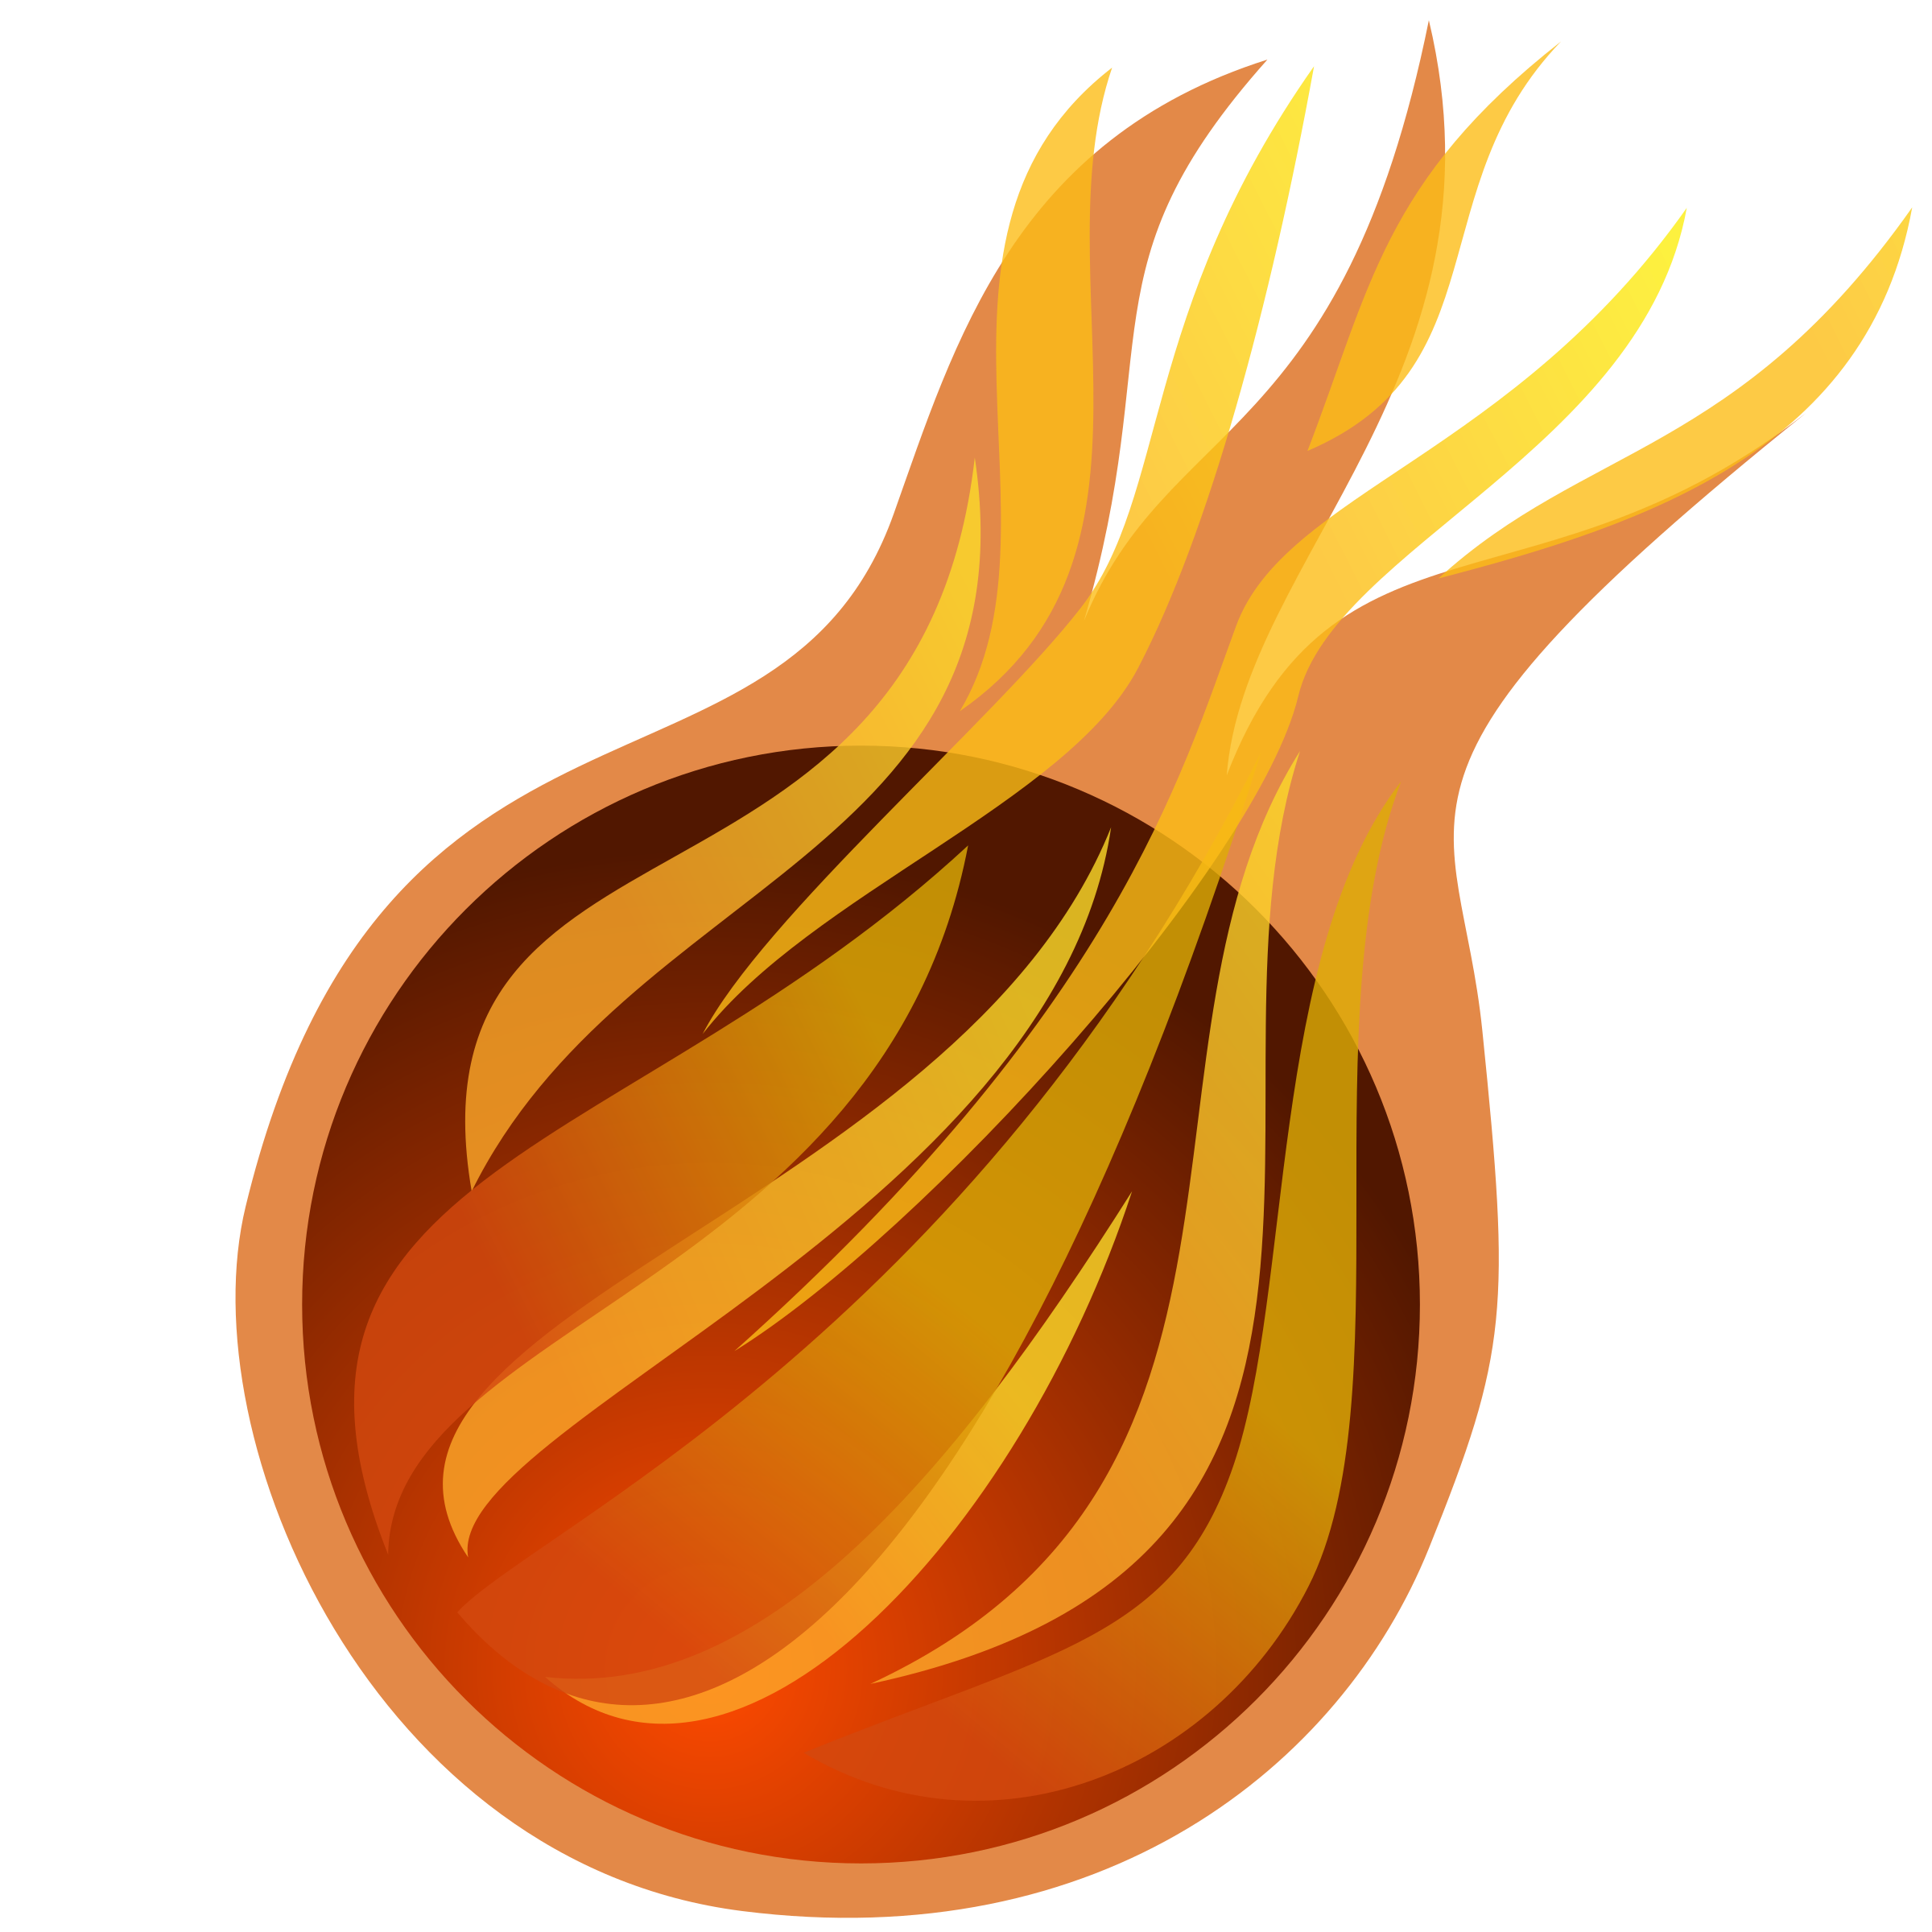 Fireball clipart. Big image png